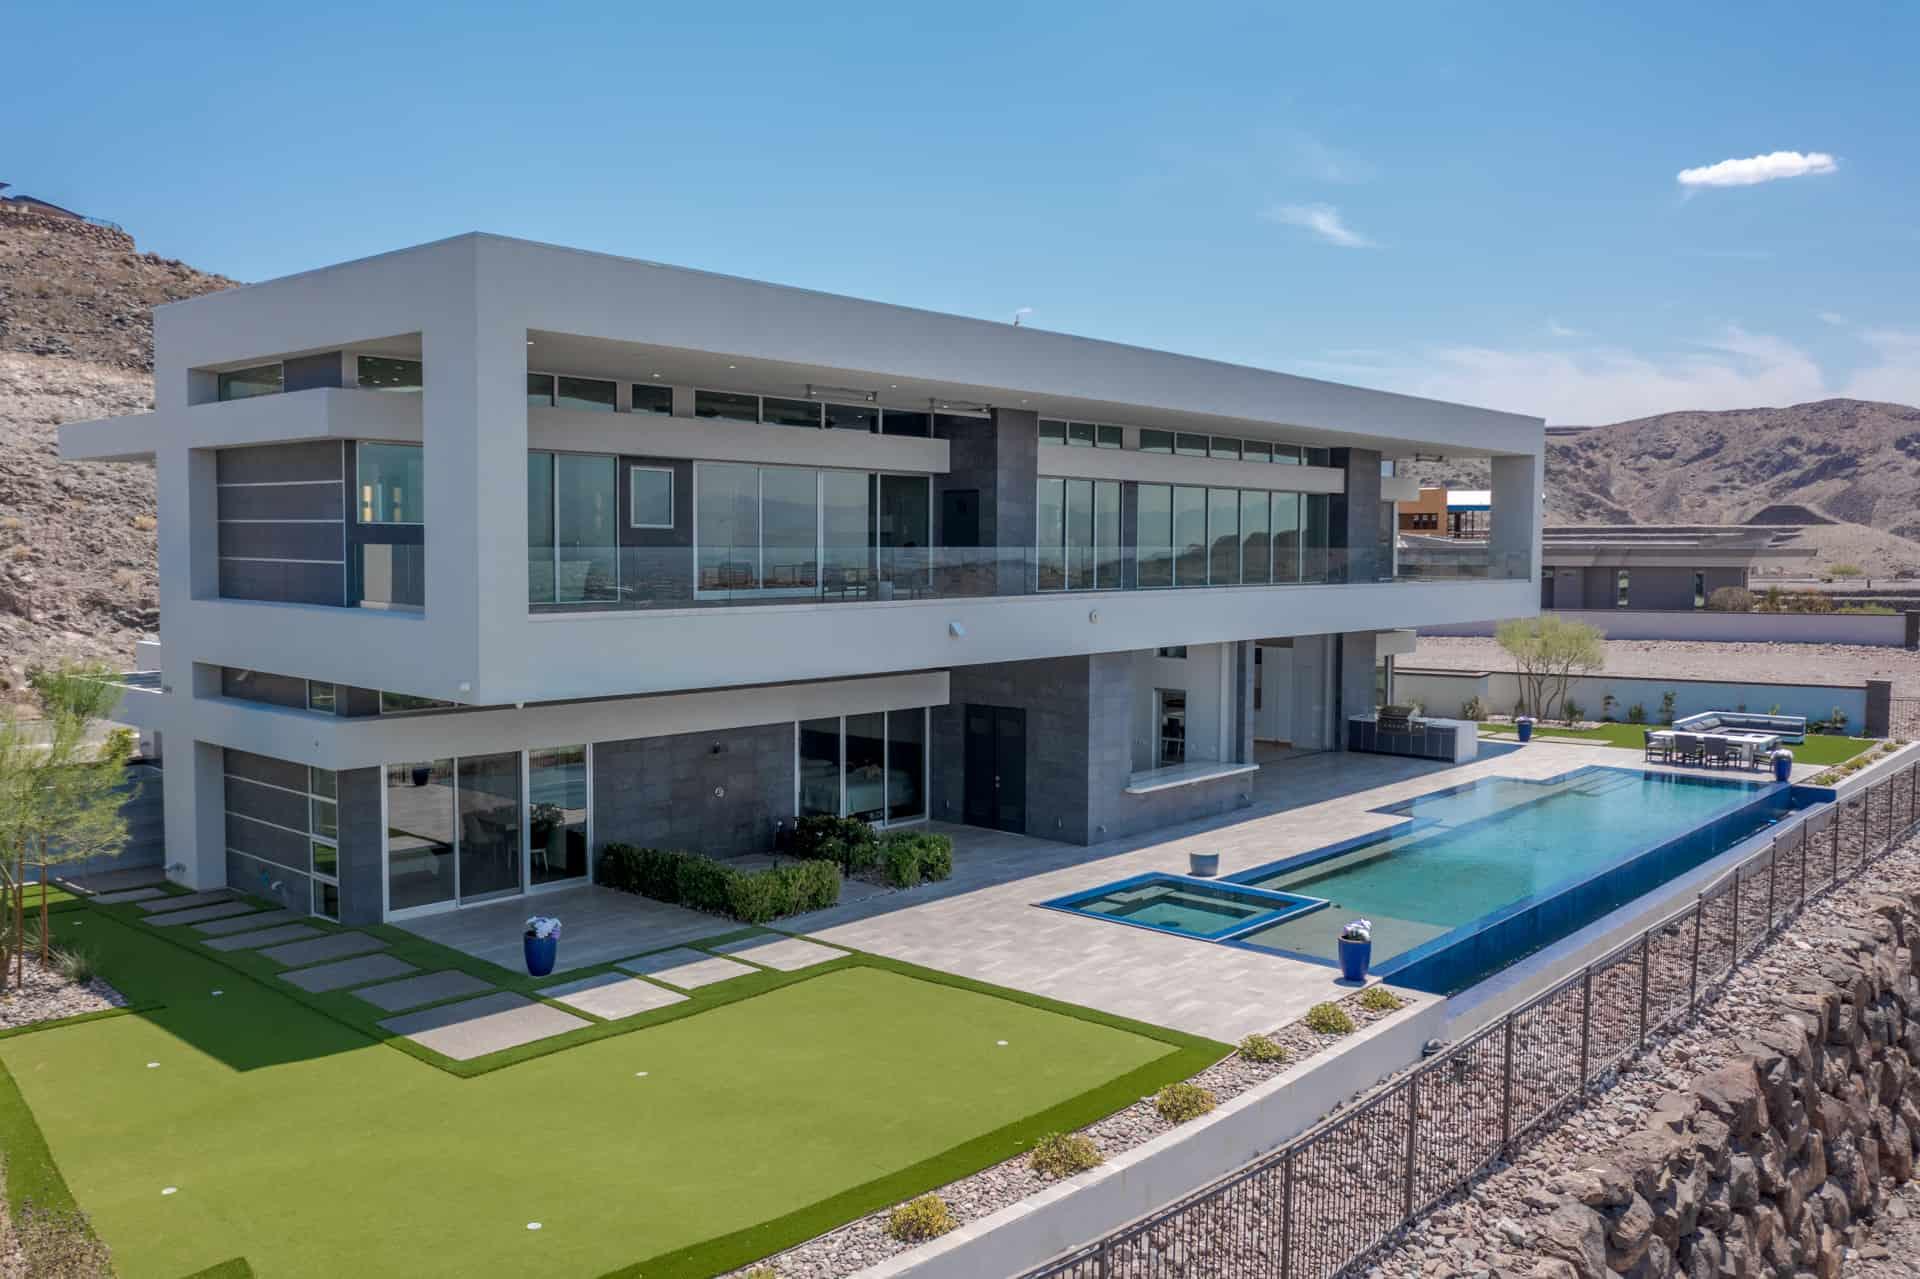 las-vegas-luxry-real-estate-realtor-rob-jensen-company-5-rockstream-drive-ascaya003